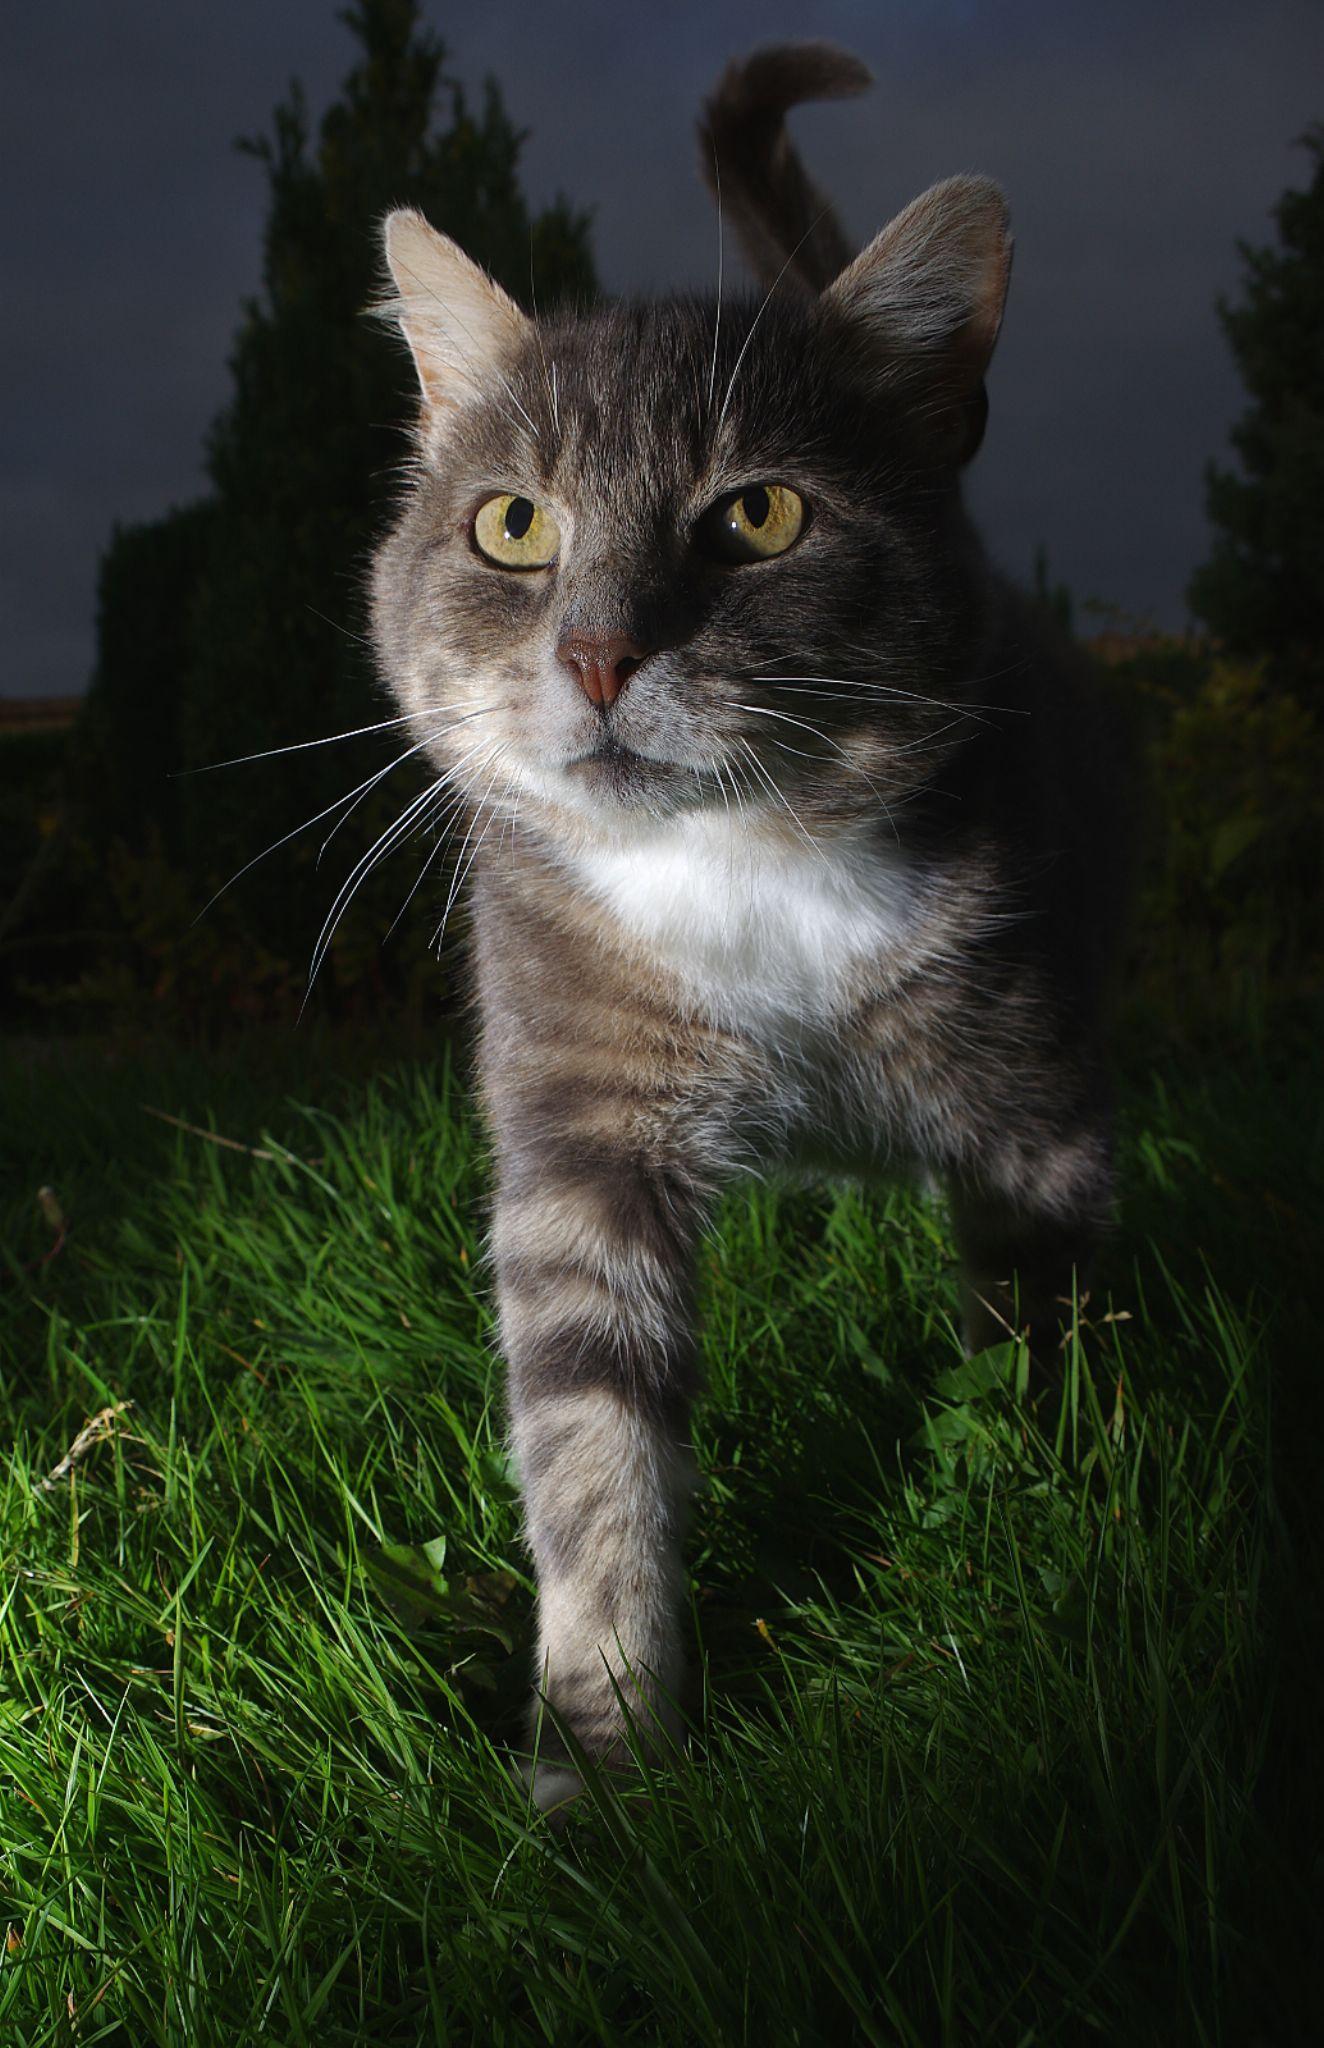 Night hunter by Turnip Towers